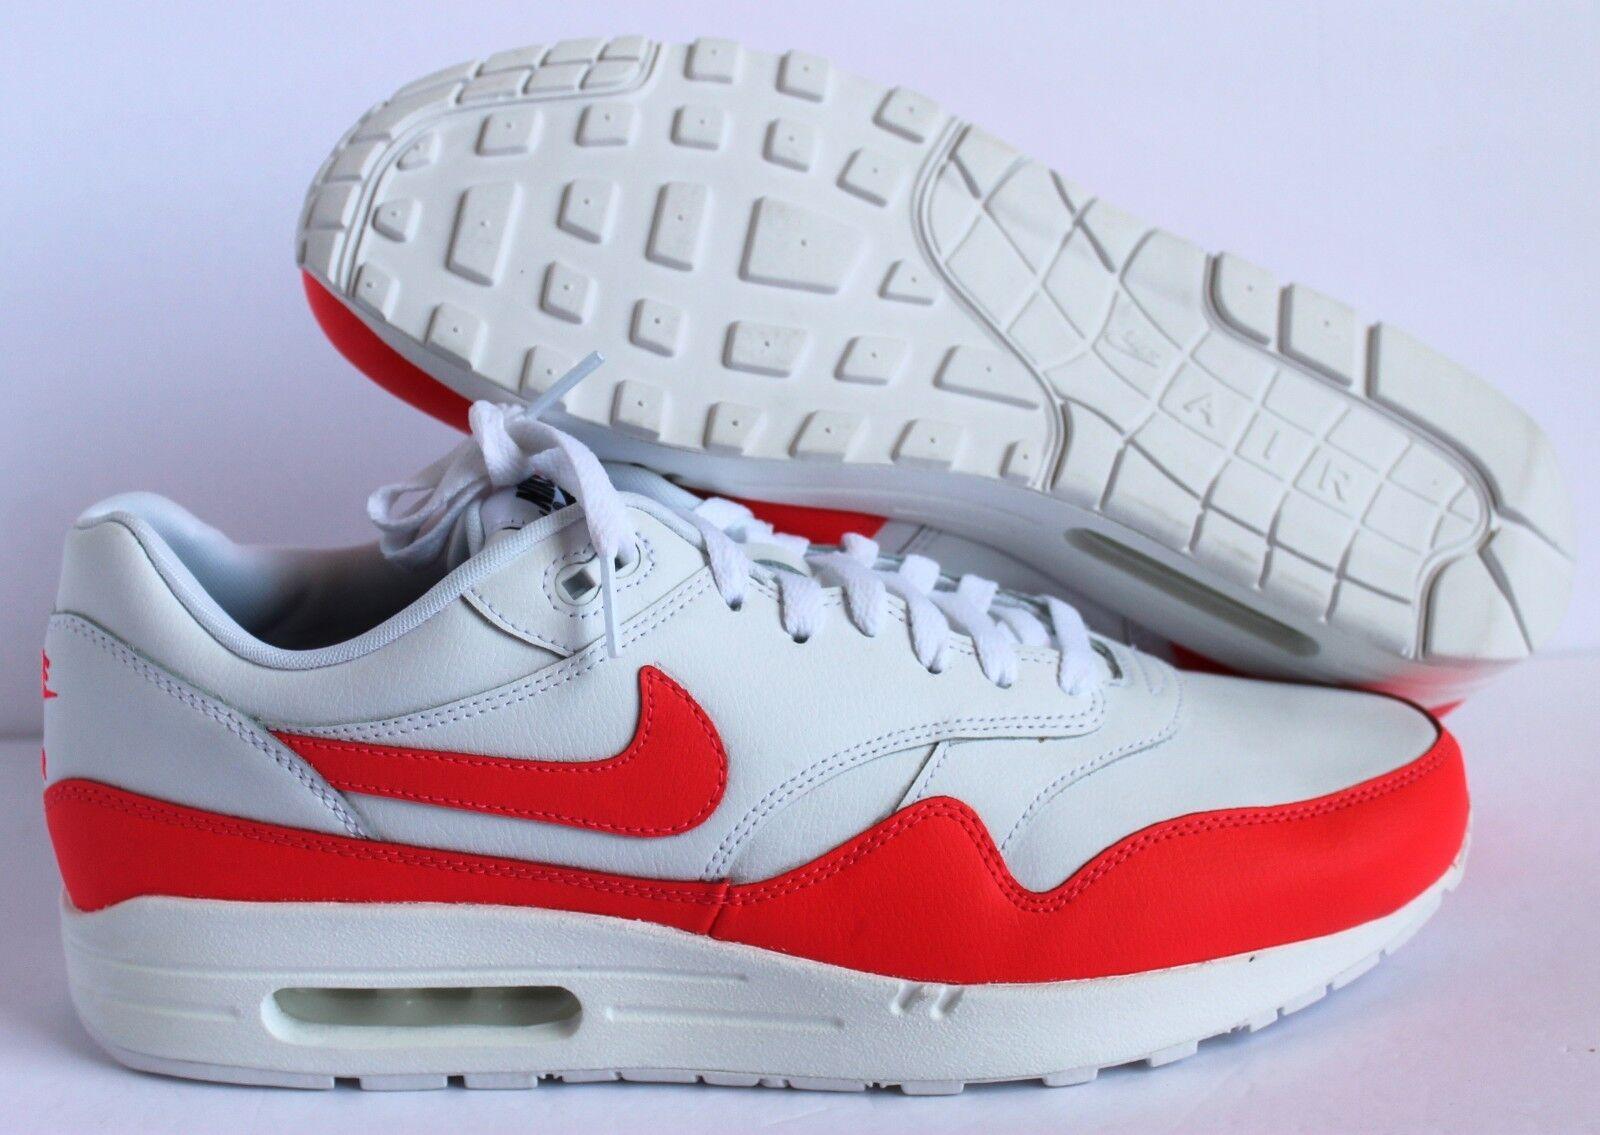 Nike id air max 1 id Nike Weiß-pink sz 12 [943756-991] 783c06